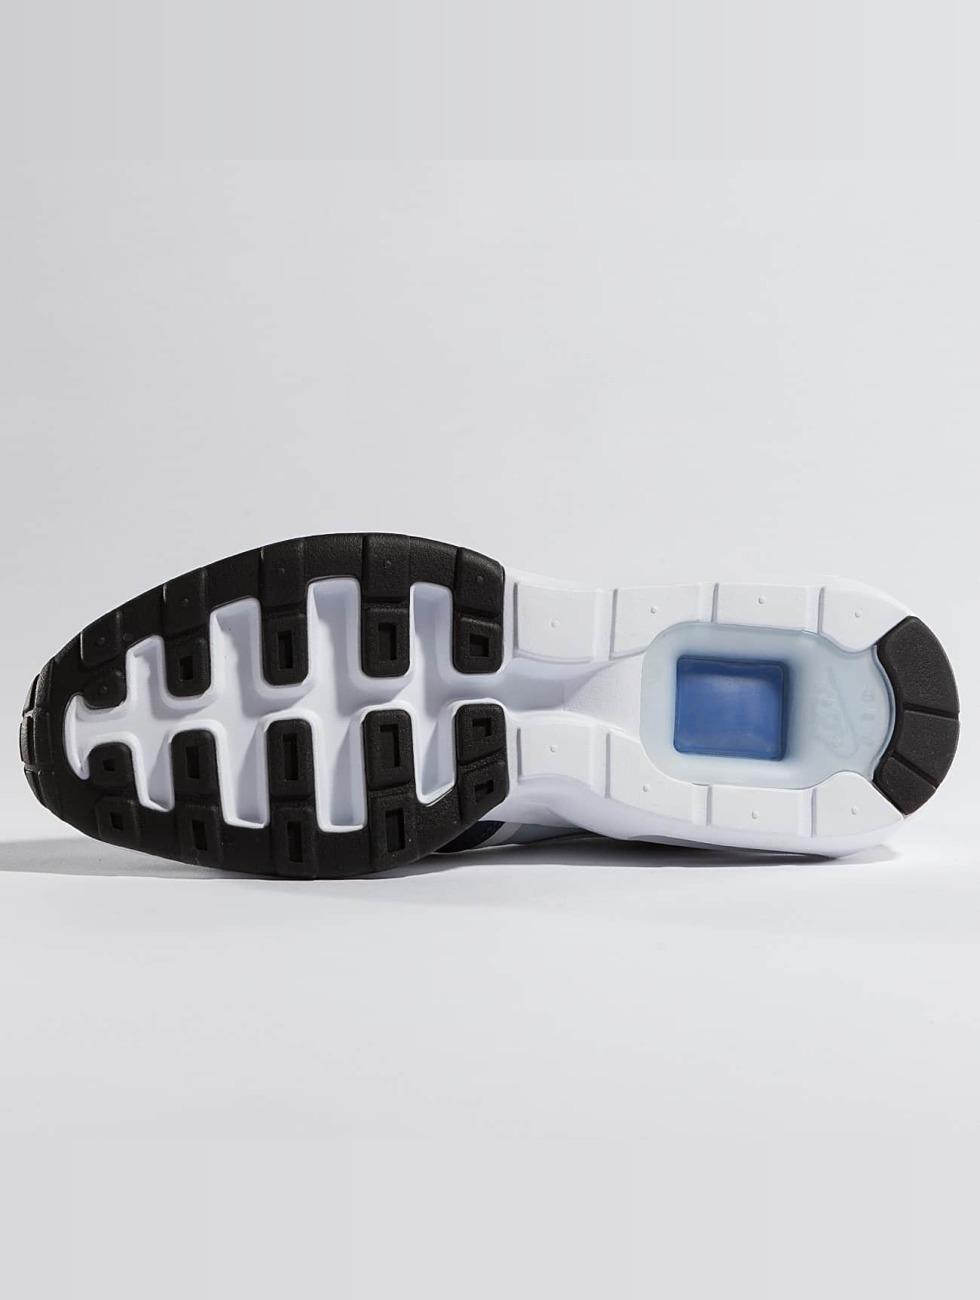 Vente Pas Cher Grand Meilleur Endroit Pour Acheter Nike Chaussure / Air Chaussure Gris Max Prime 334 202 Clairance Nicekicks YL6ufV